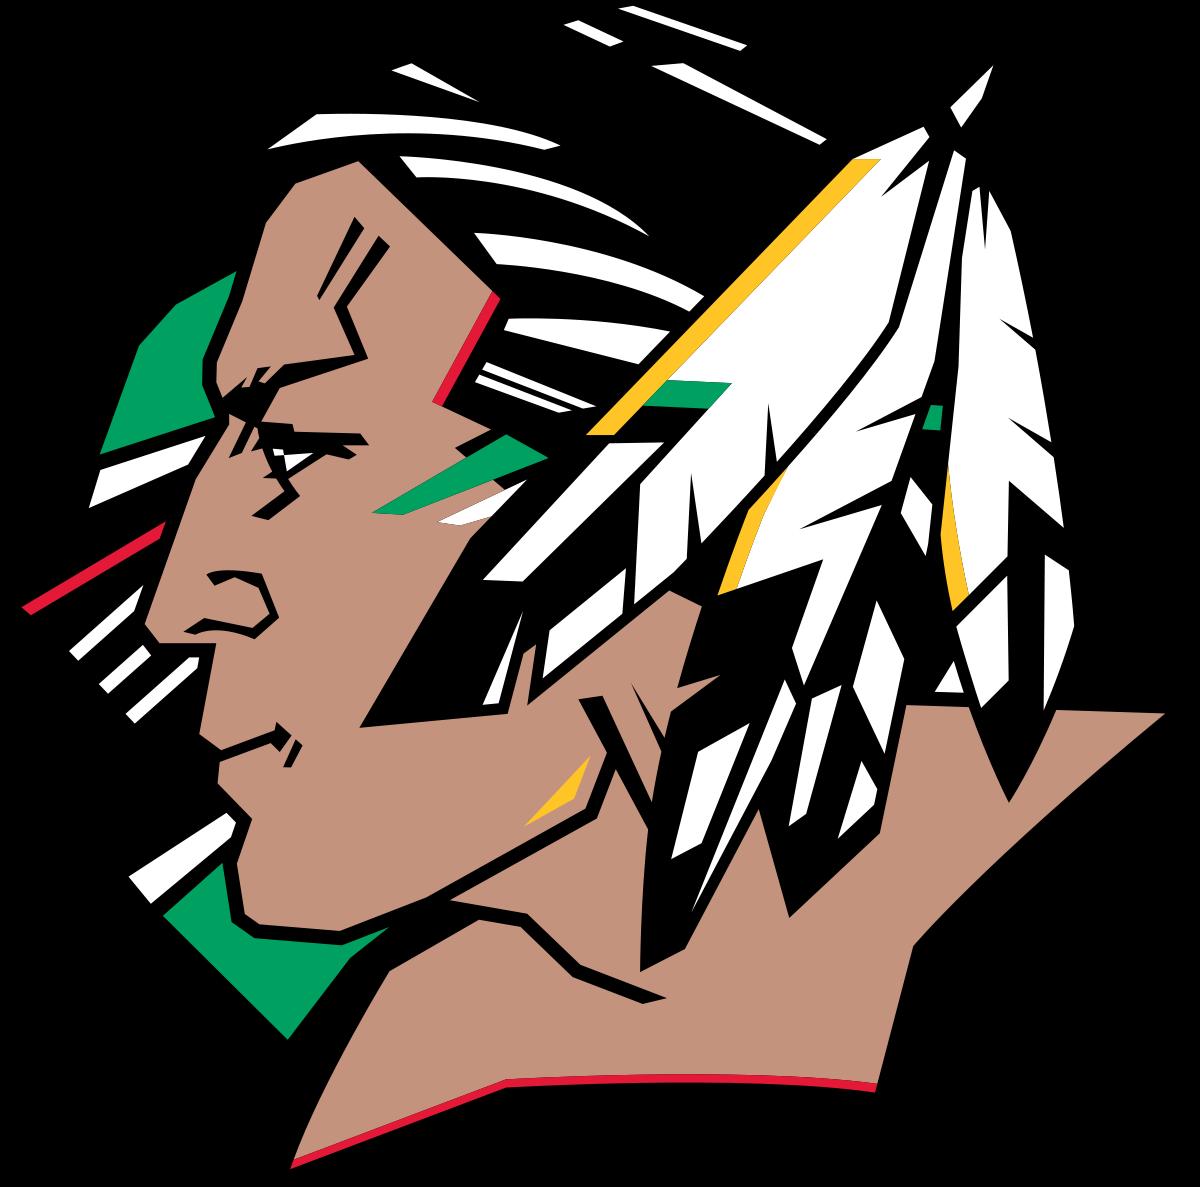 Hawks football clipart clip art freeuse stock 2011 North Dakota Fighting Sioux football team - Wikipedia clip art freeuse stock